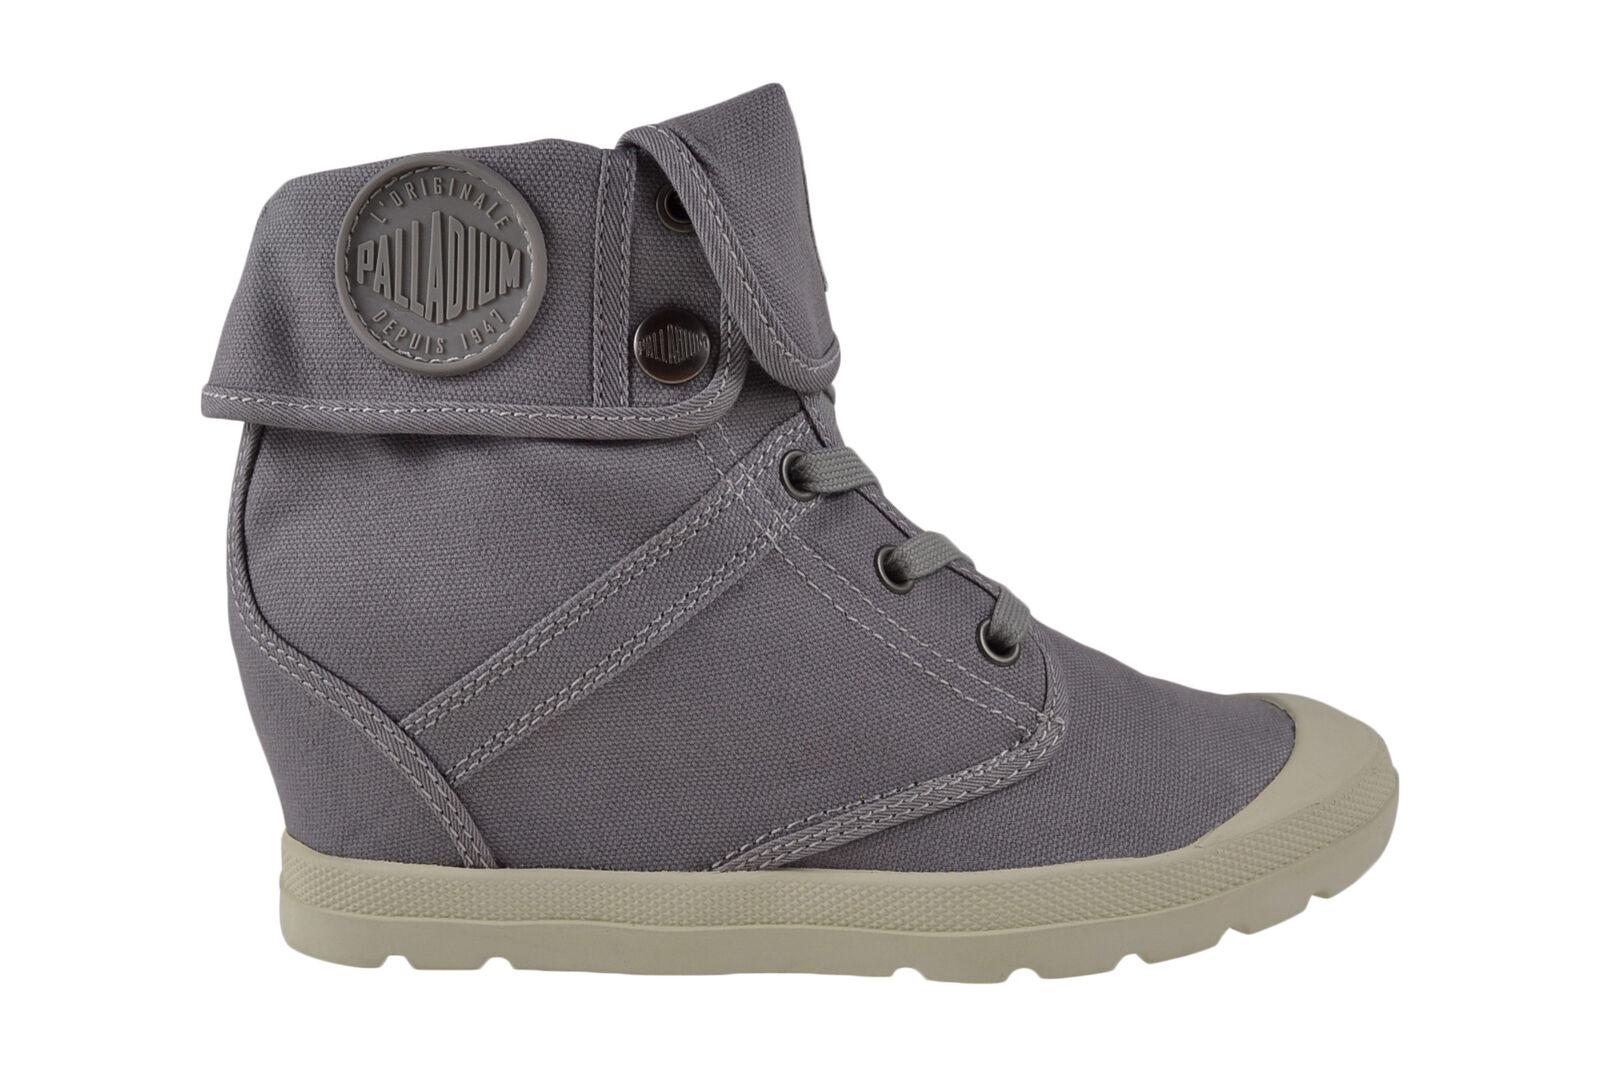 Palladium Pallaroute CVS titanium Sneaker/Schuhe grau